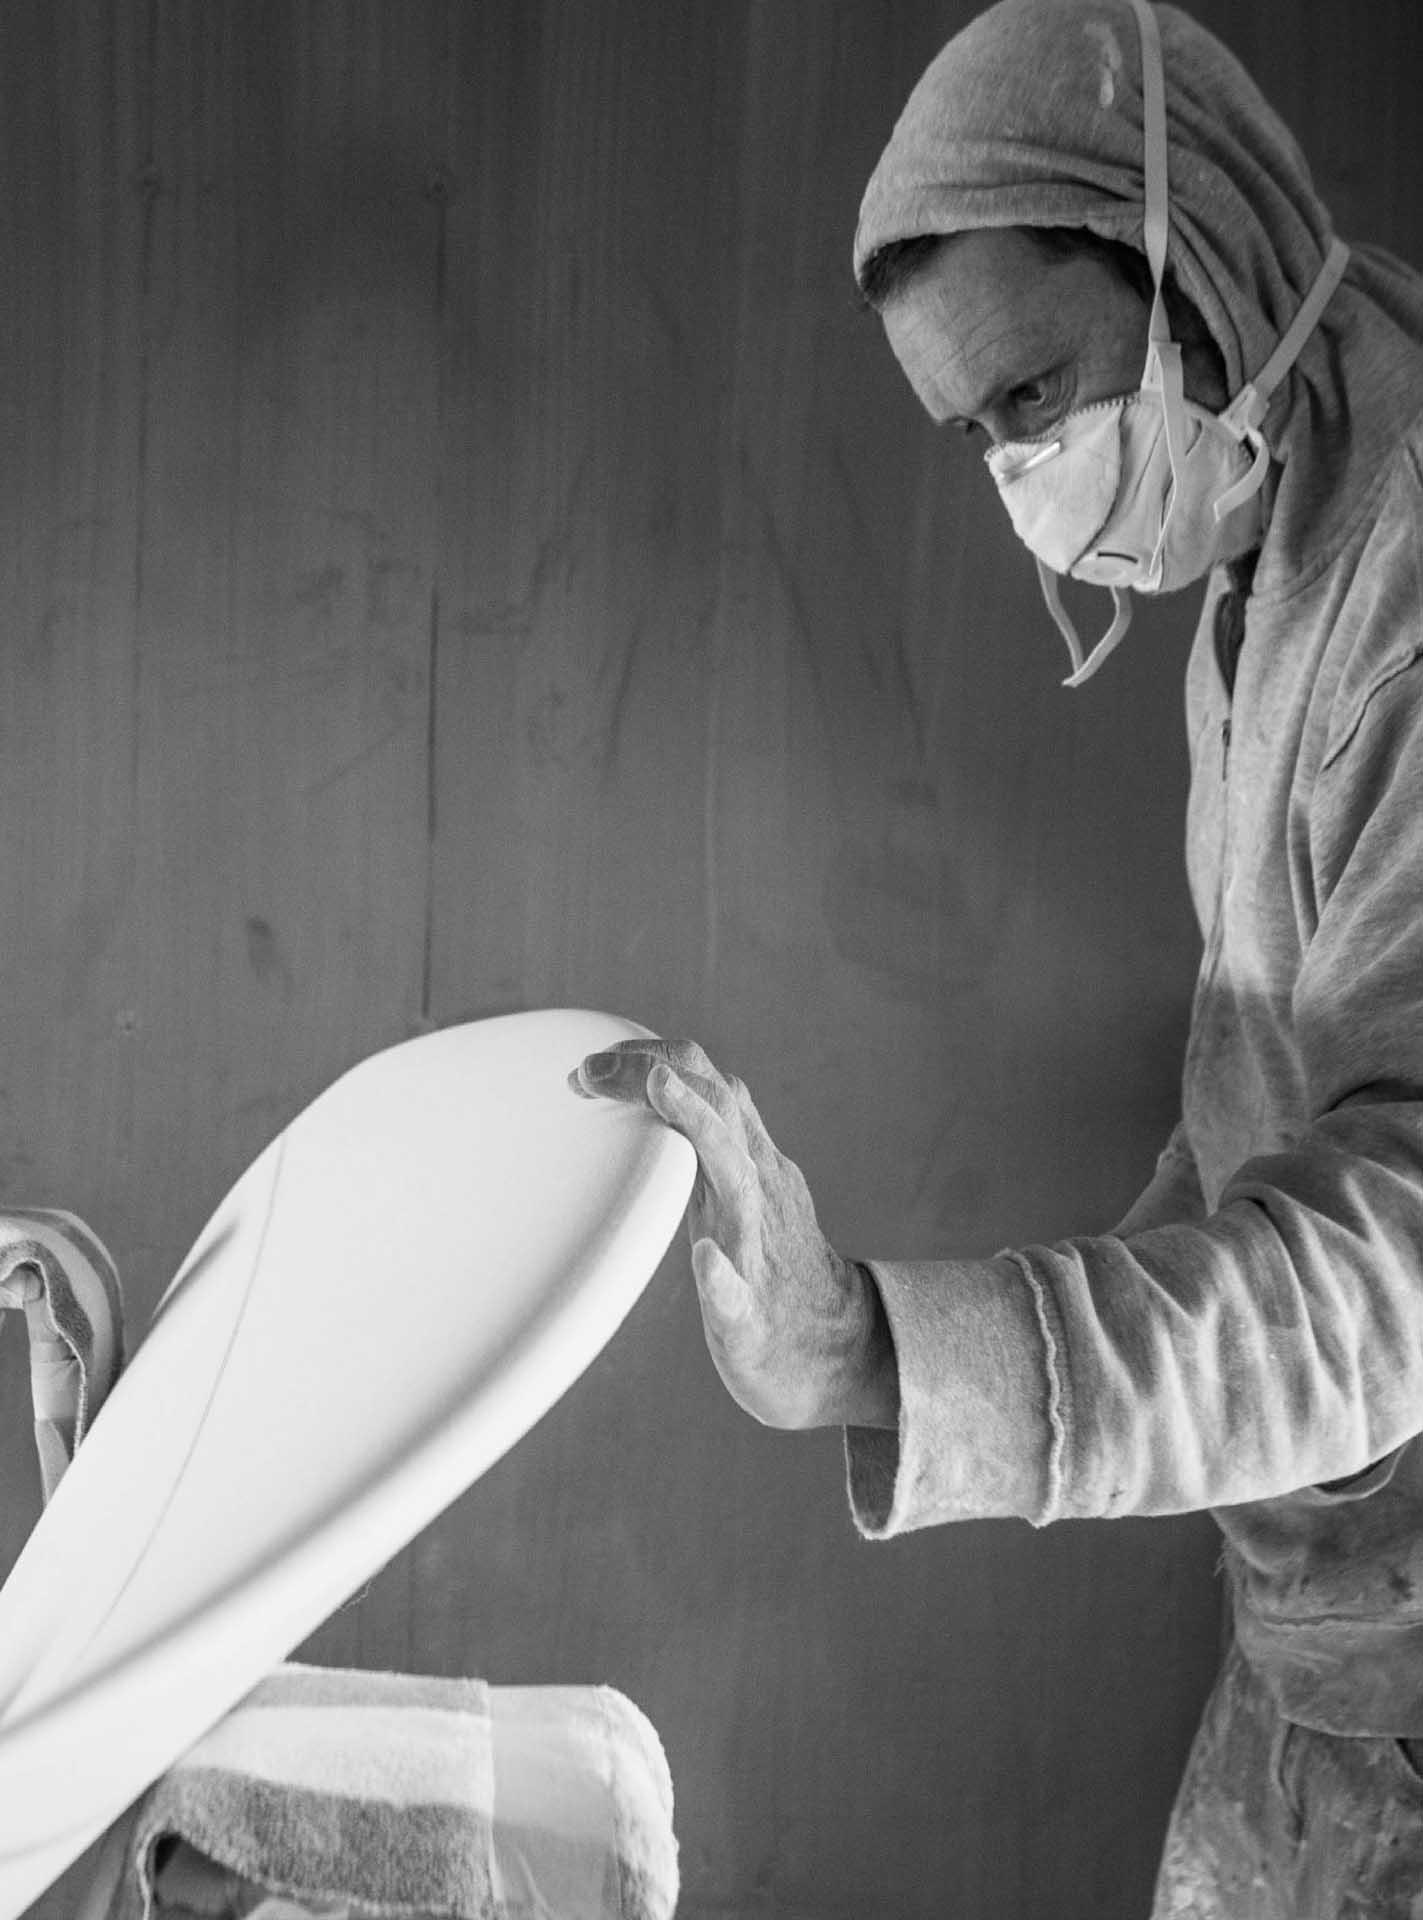 Luke Underwood Creations Surfboards